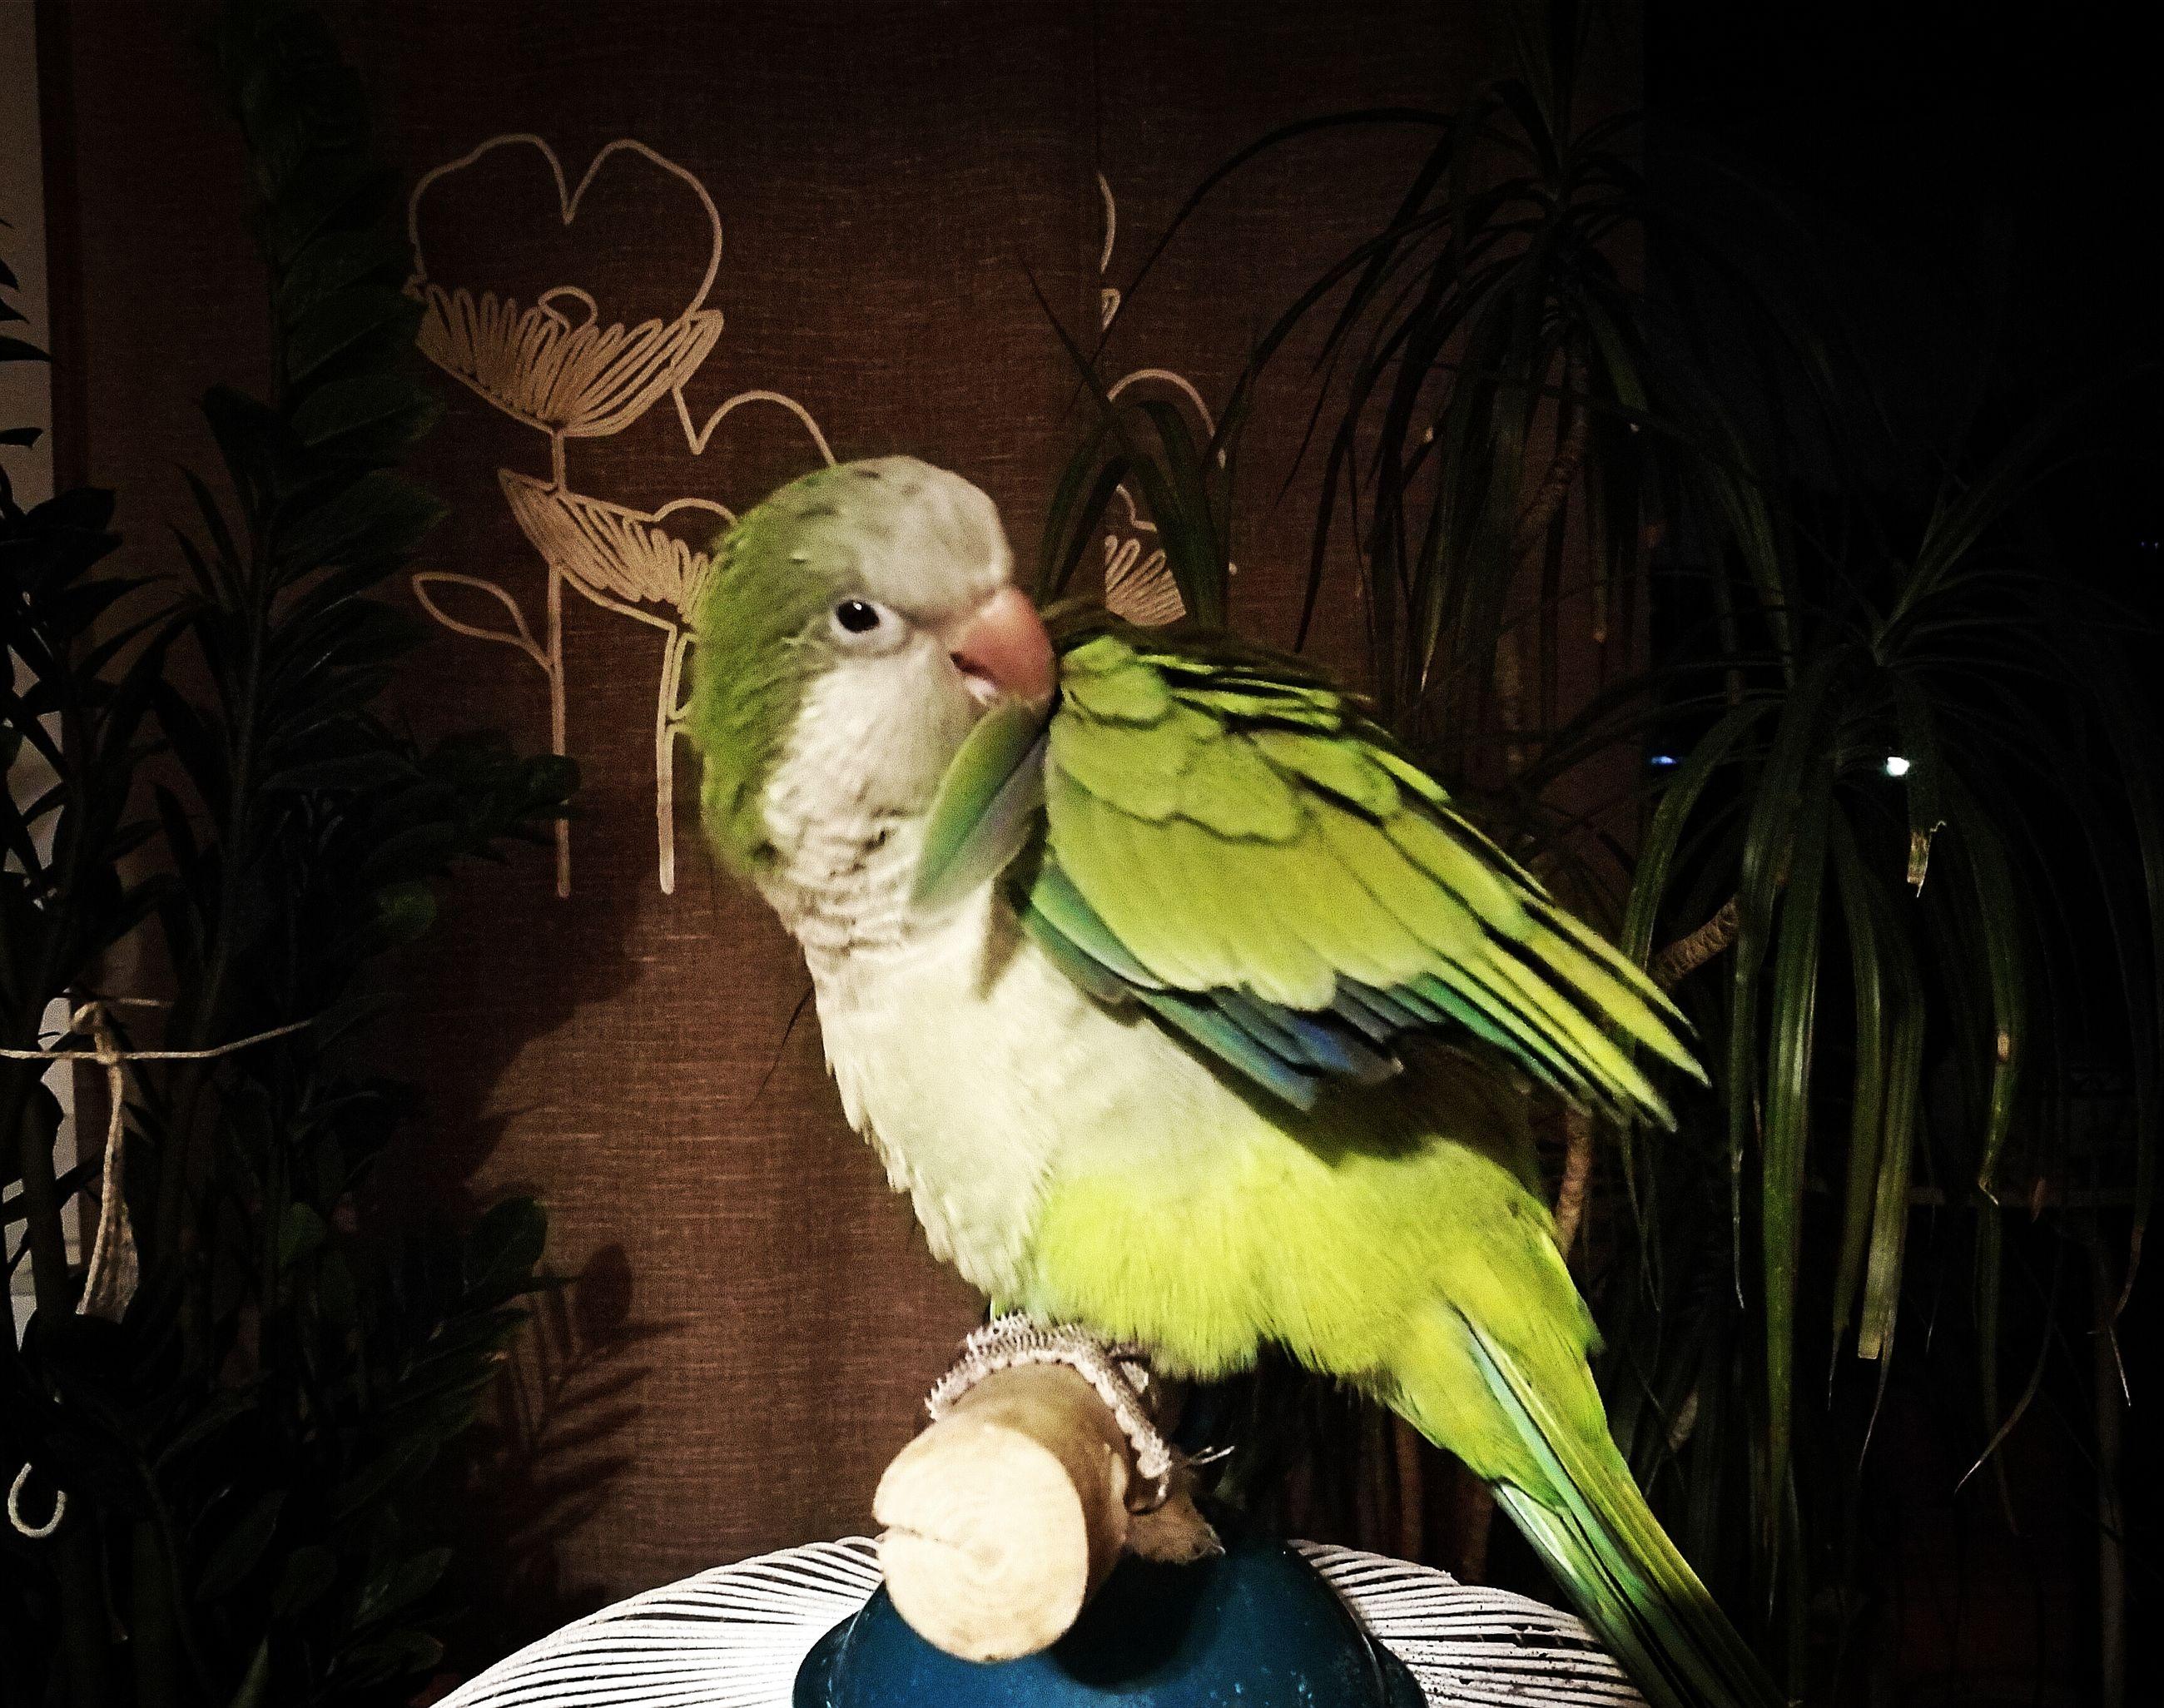 animal themes, bird, one animal, perching, zoology, green color, nature, no people, beak, domestic animals, animal